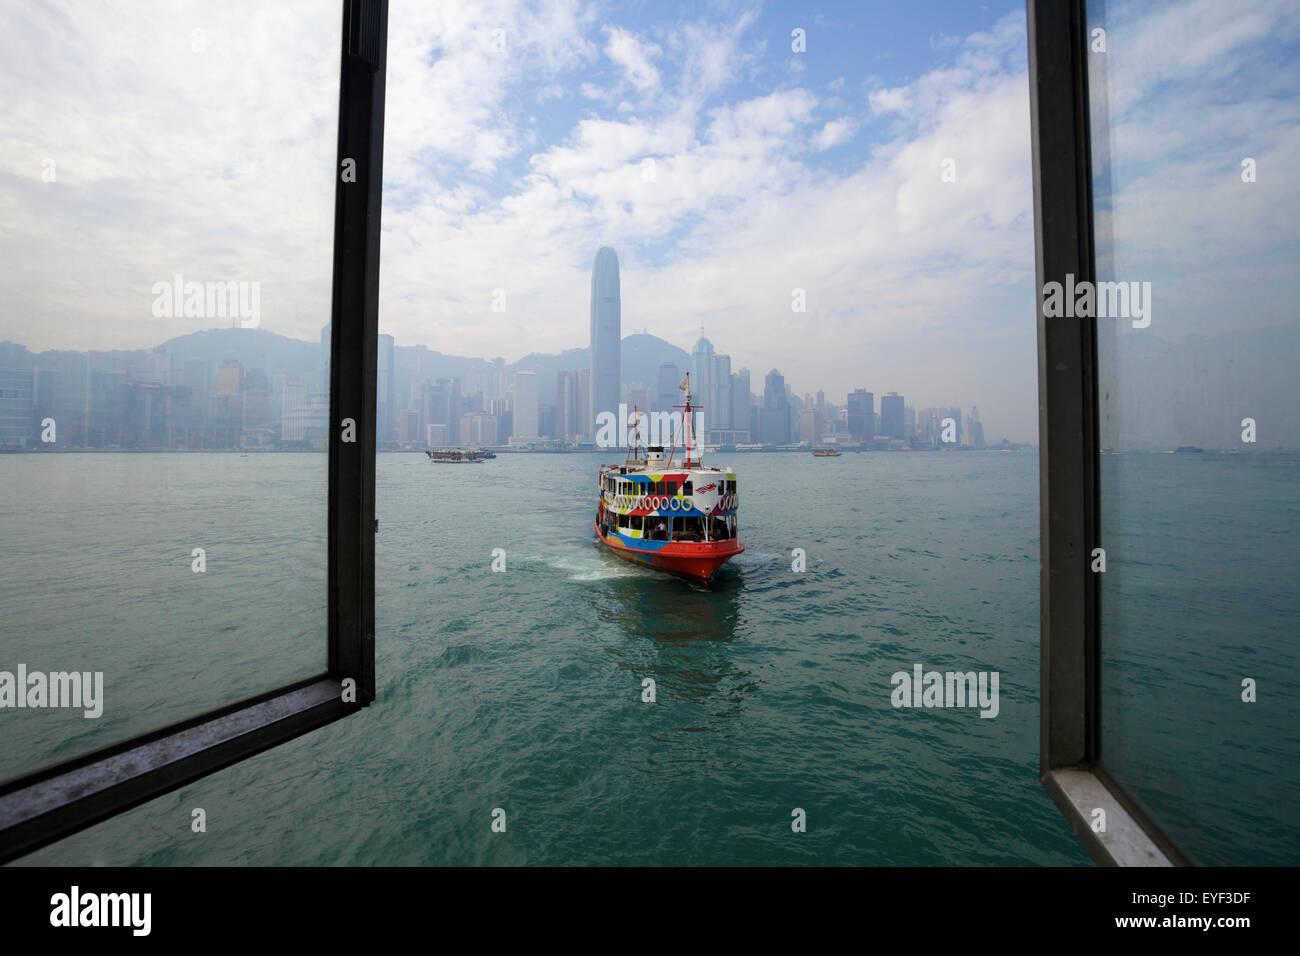 Star Ferry arriving at Tsim Sha Tsui terminal; Hong Kong - Stock Image